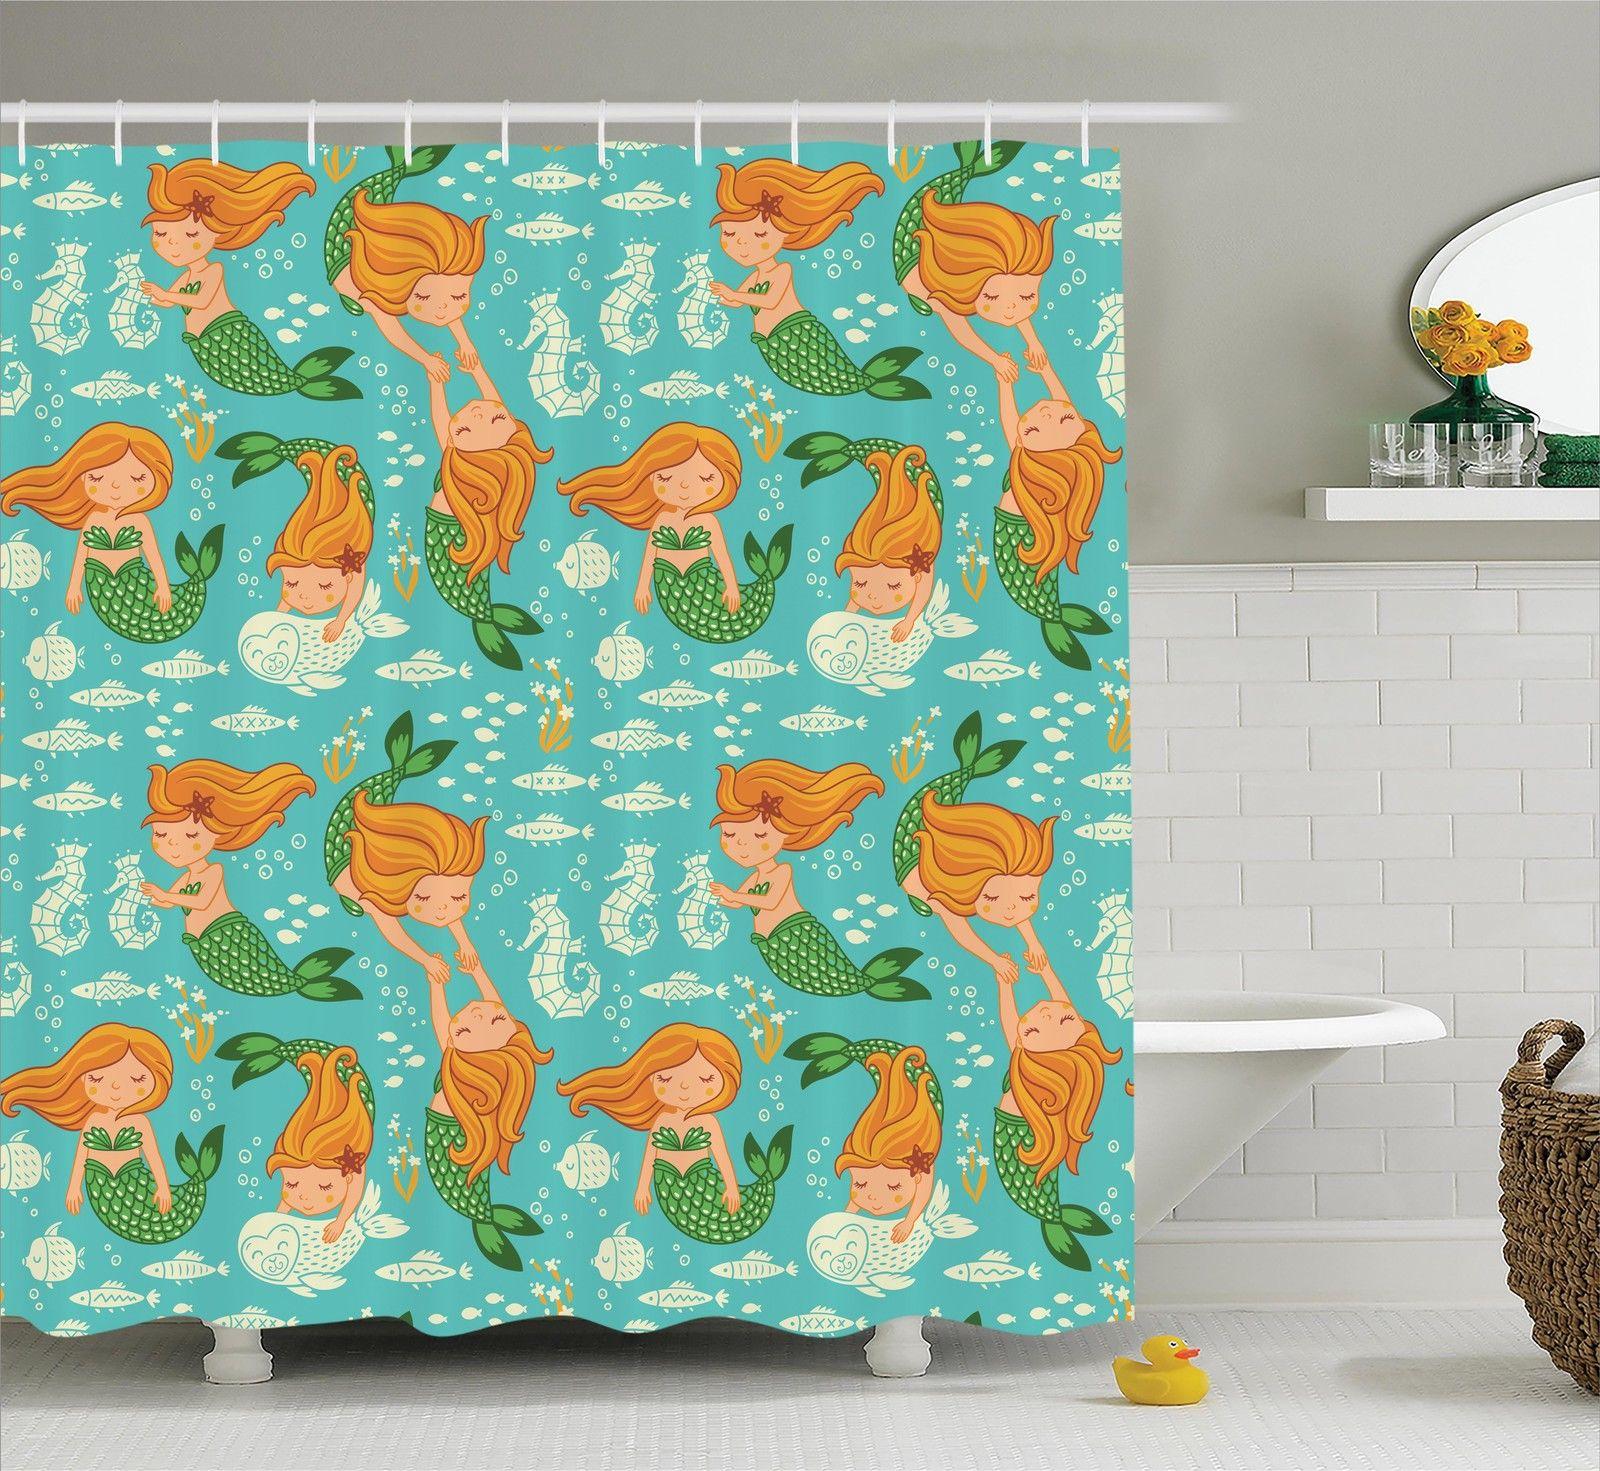 Shower Curtains Details About Cartoon, Little Mermaid Bathroom Accessories